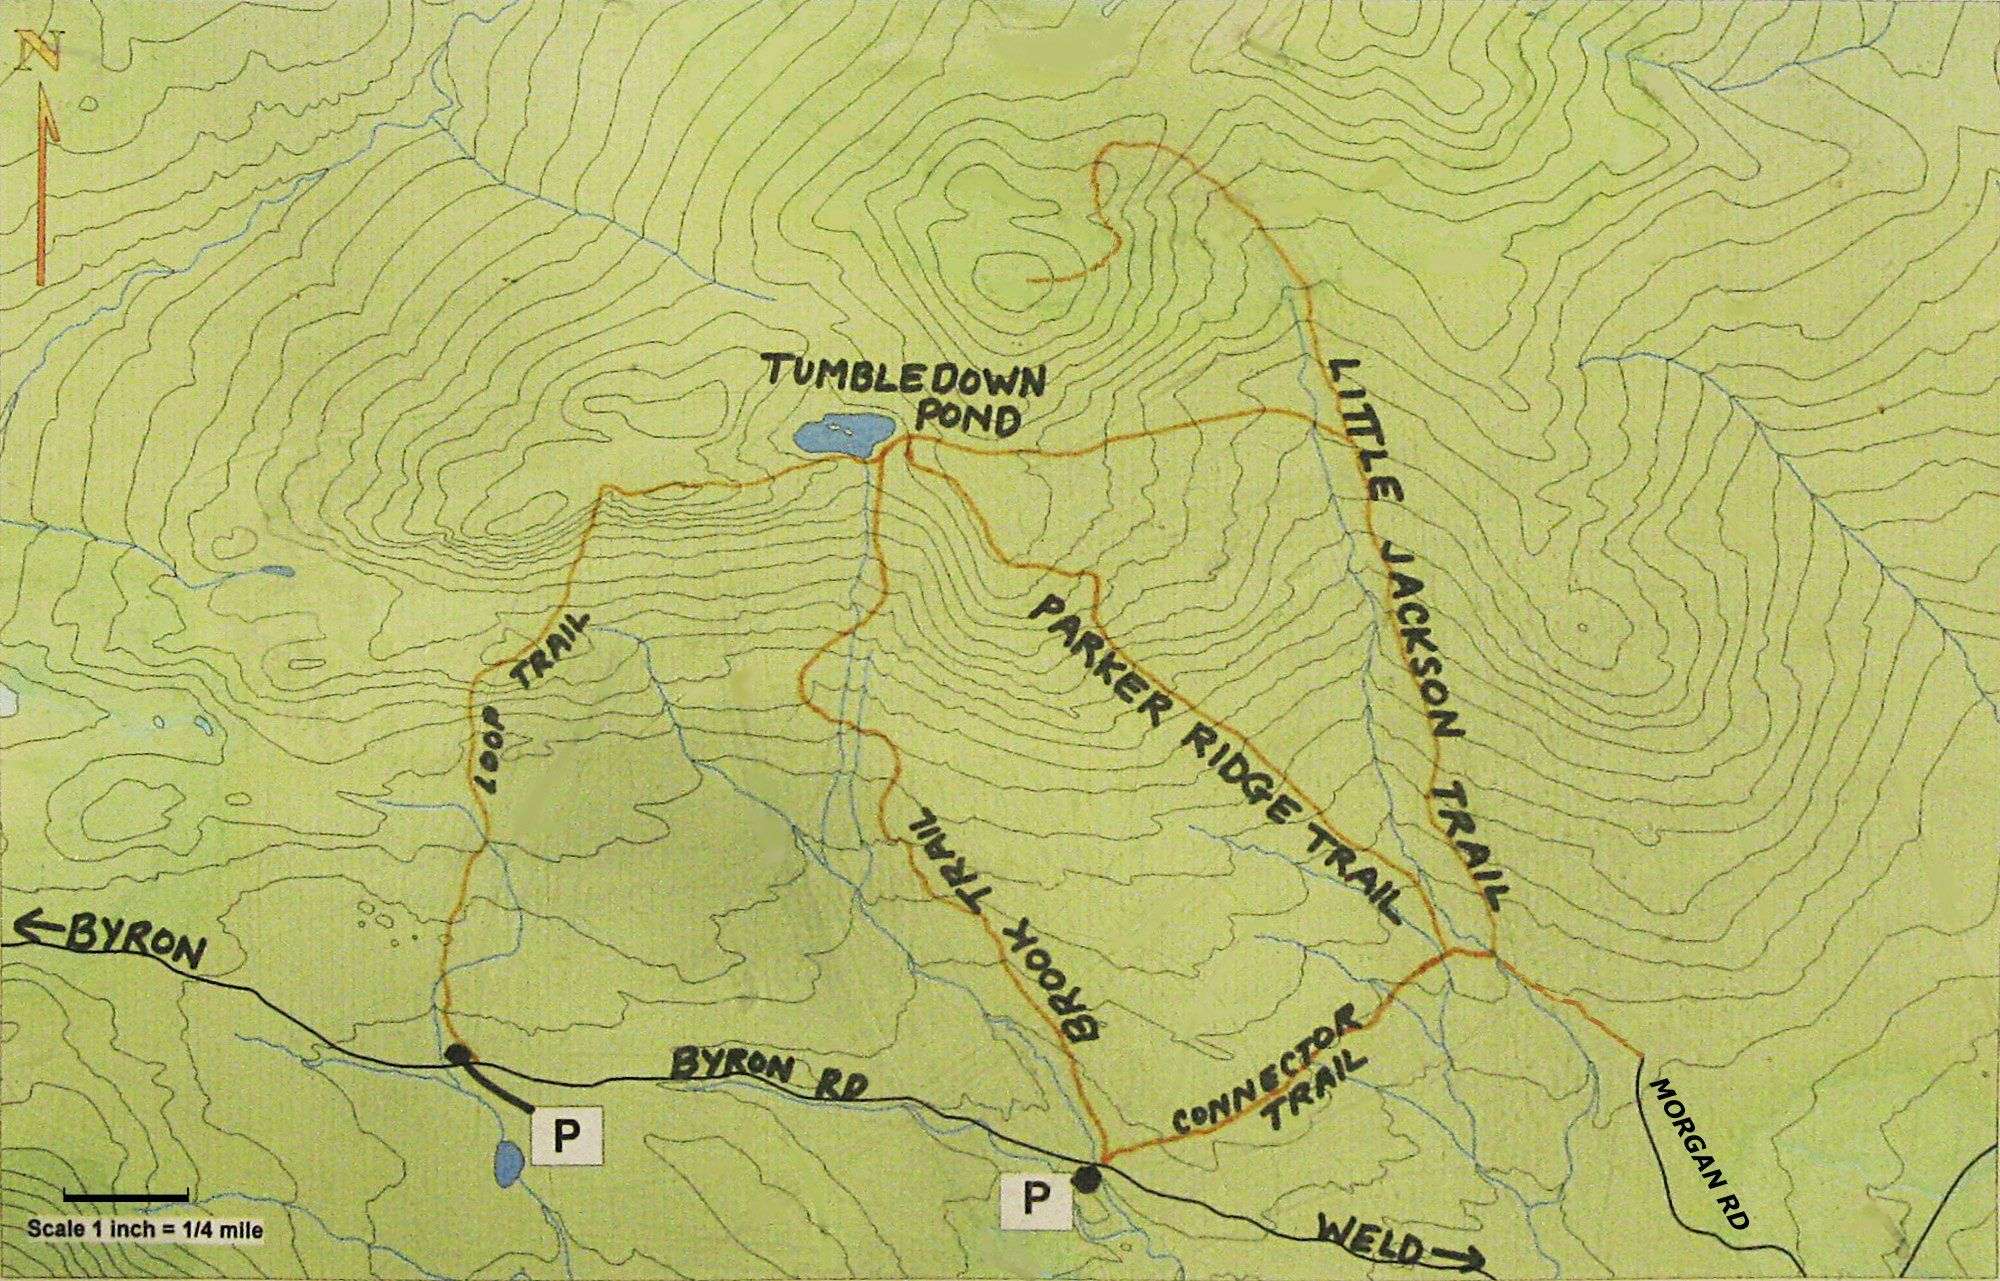 Tumbledown Mountain Trail Map Weld Farmington Area Pinterest